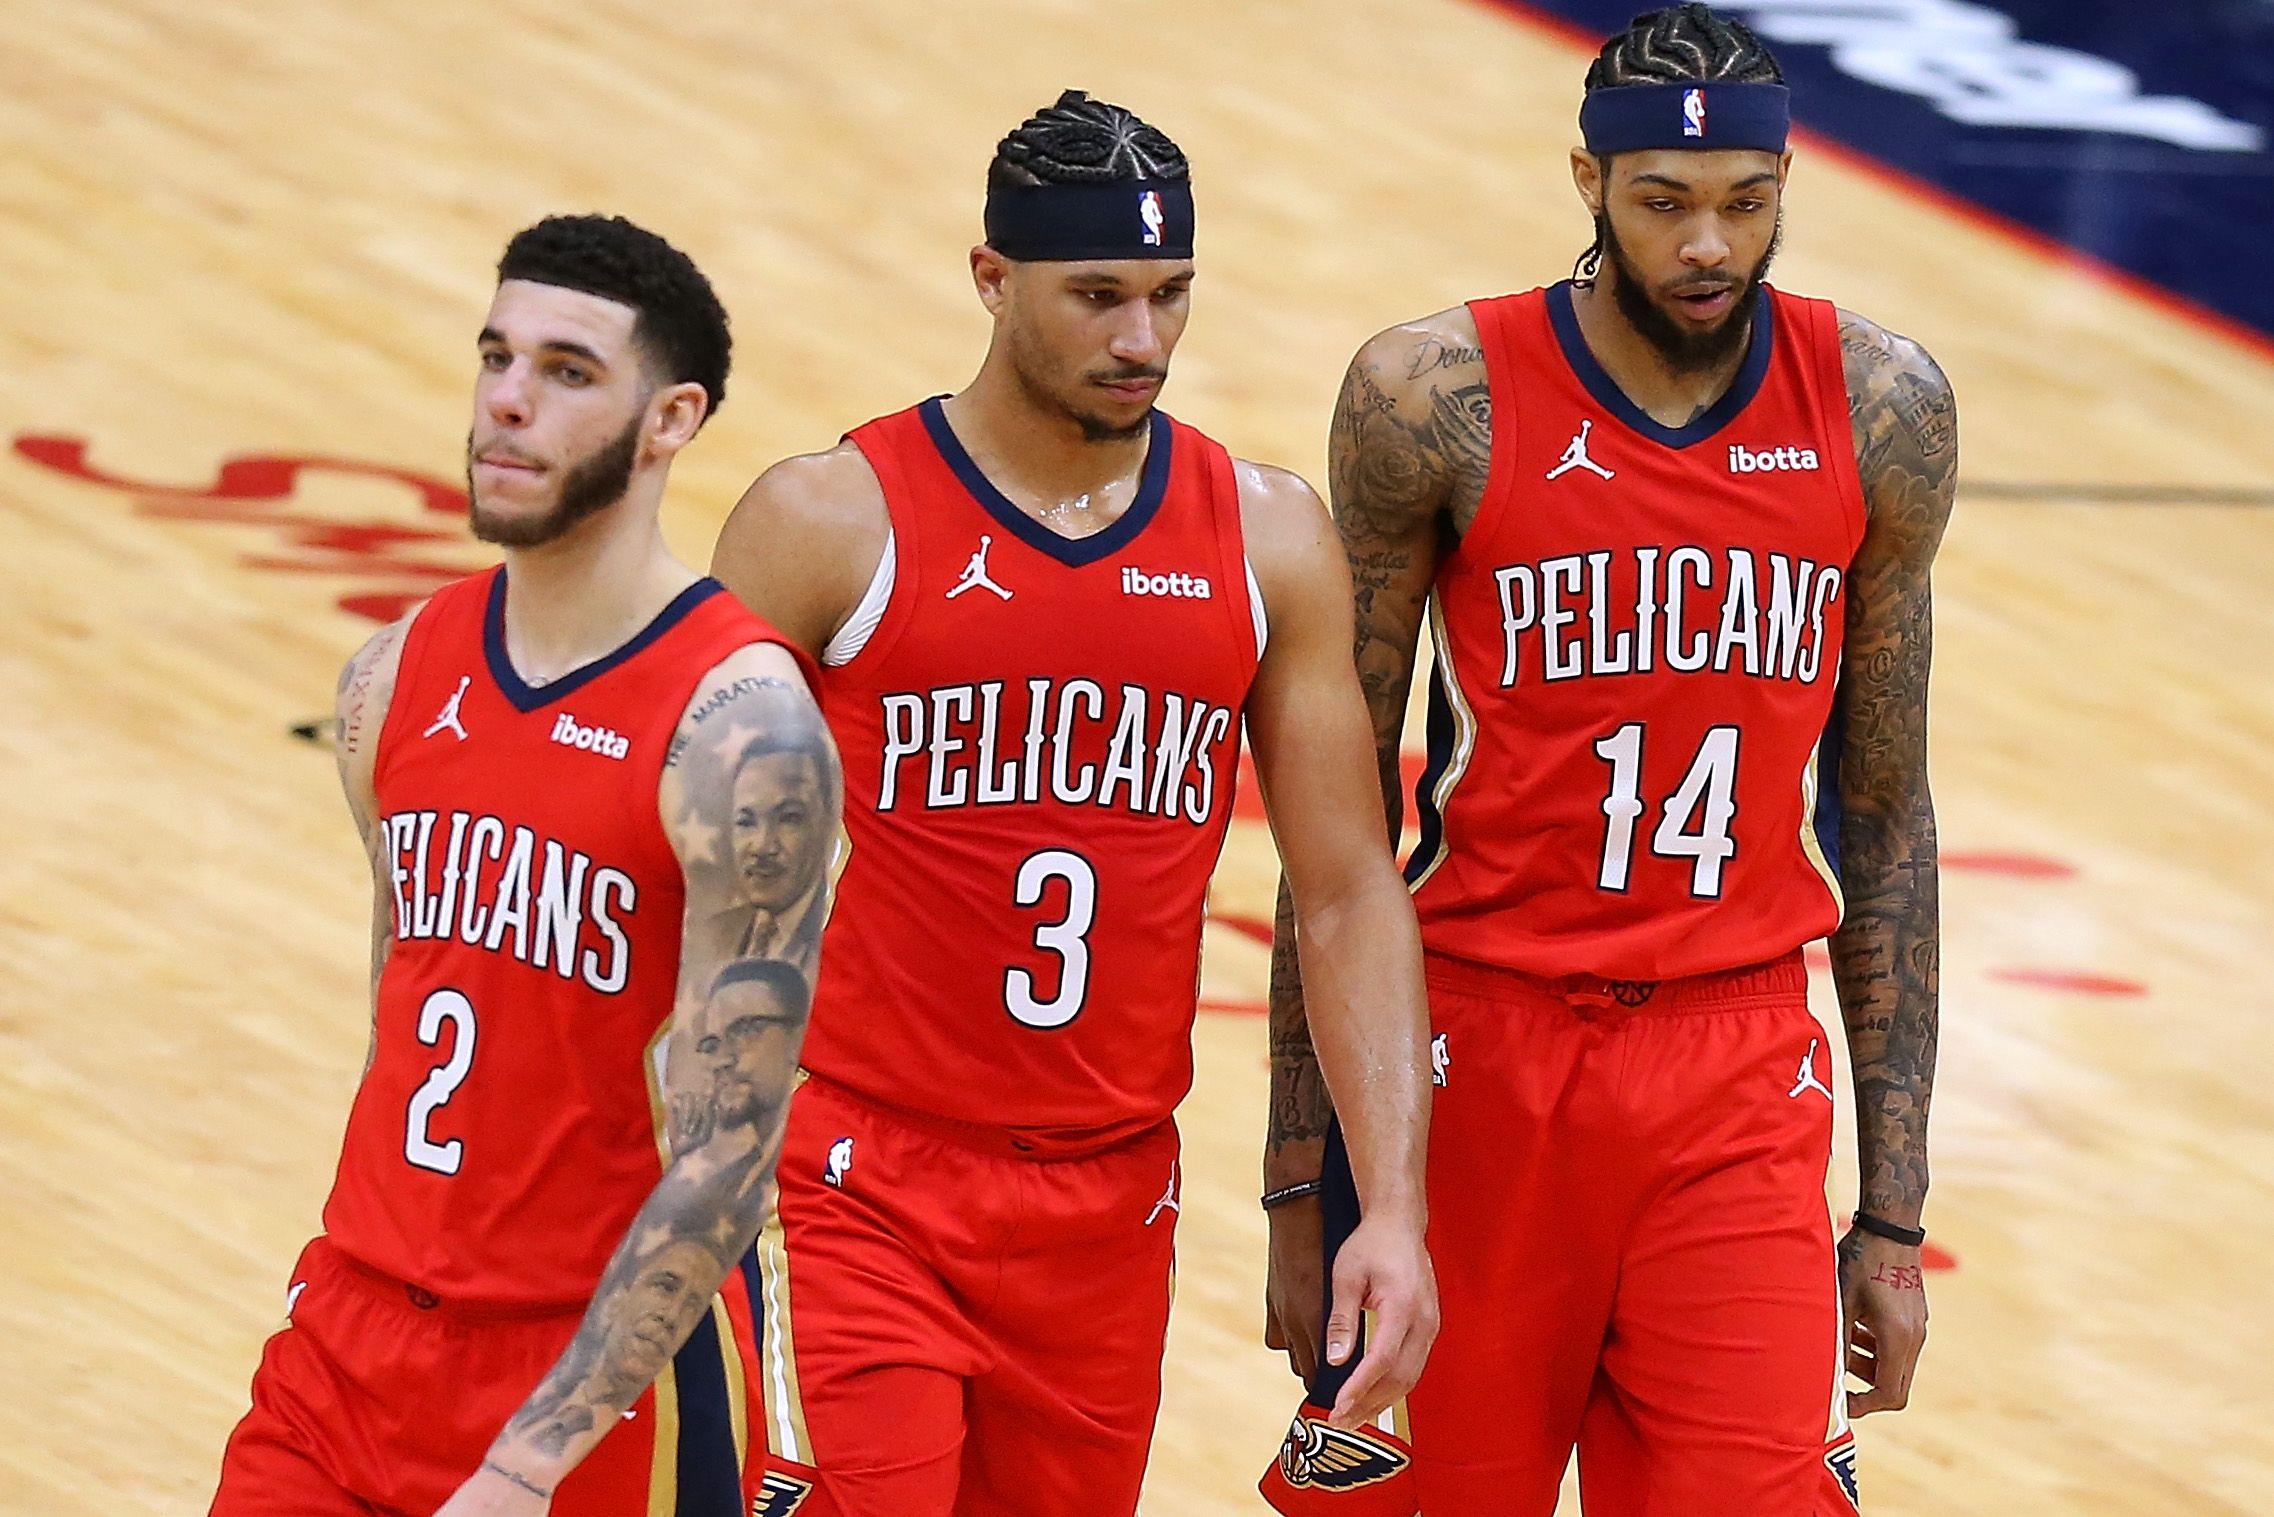 Former Lakers Lonzo Ball, Josh Hart, and Brandon Ingram walking together inside the court